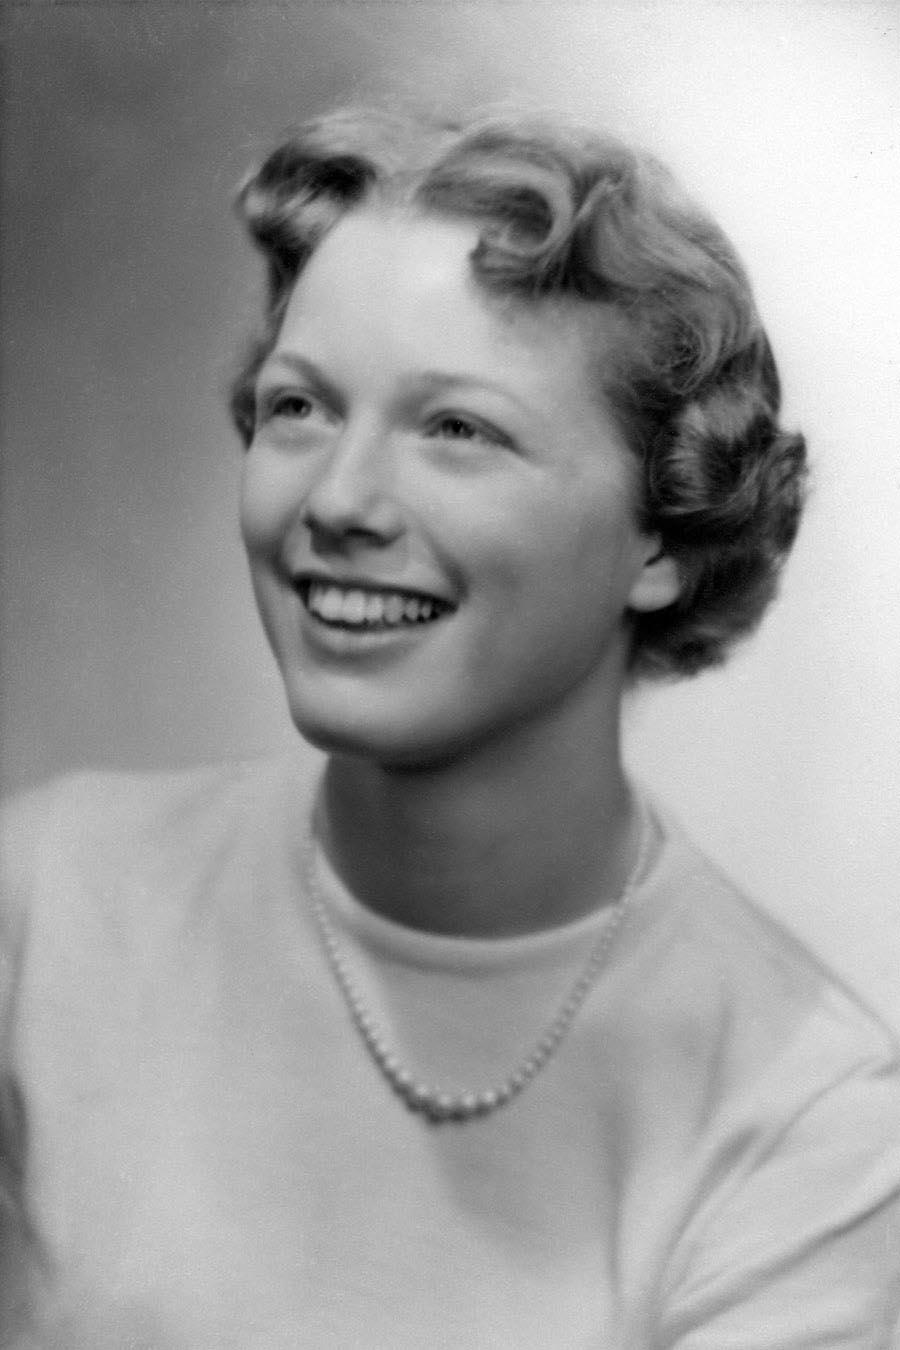 Virginia Poole